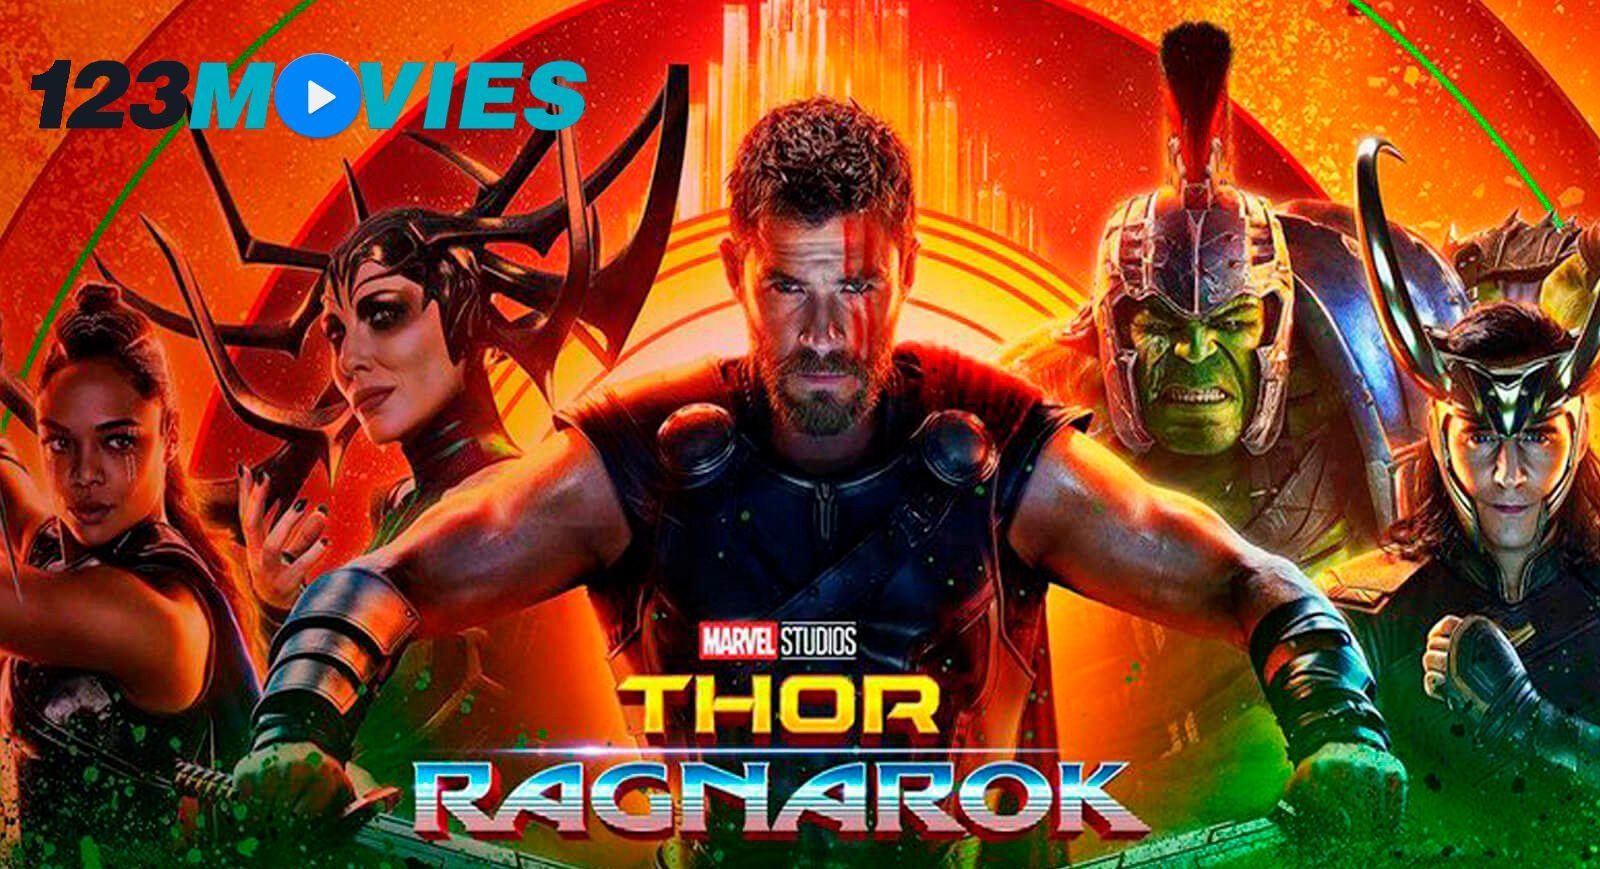 How To Watch Thor Ragnarok Online Free Ragnarok Movie Thor Ragnarok Movie Watch Thor